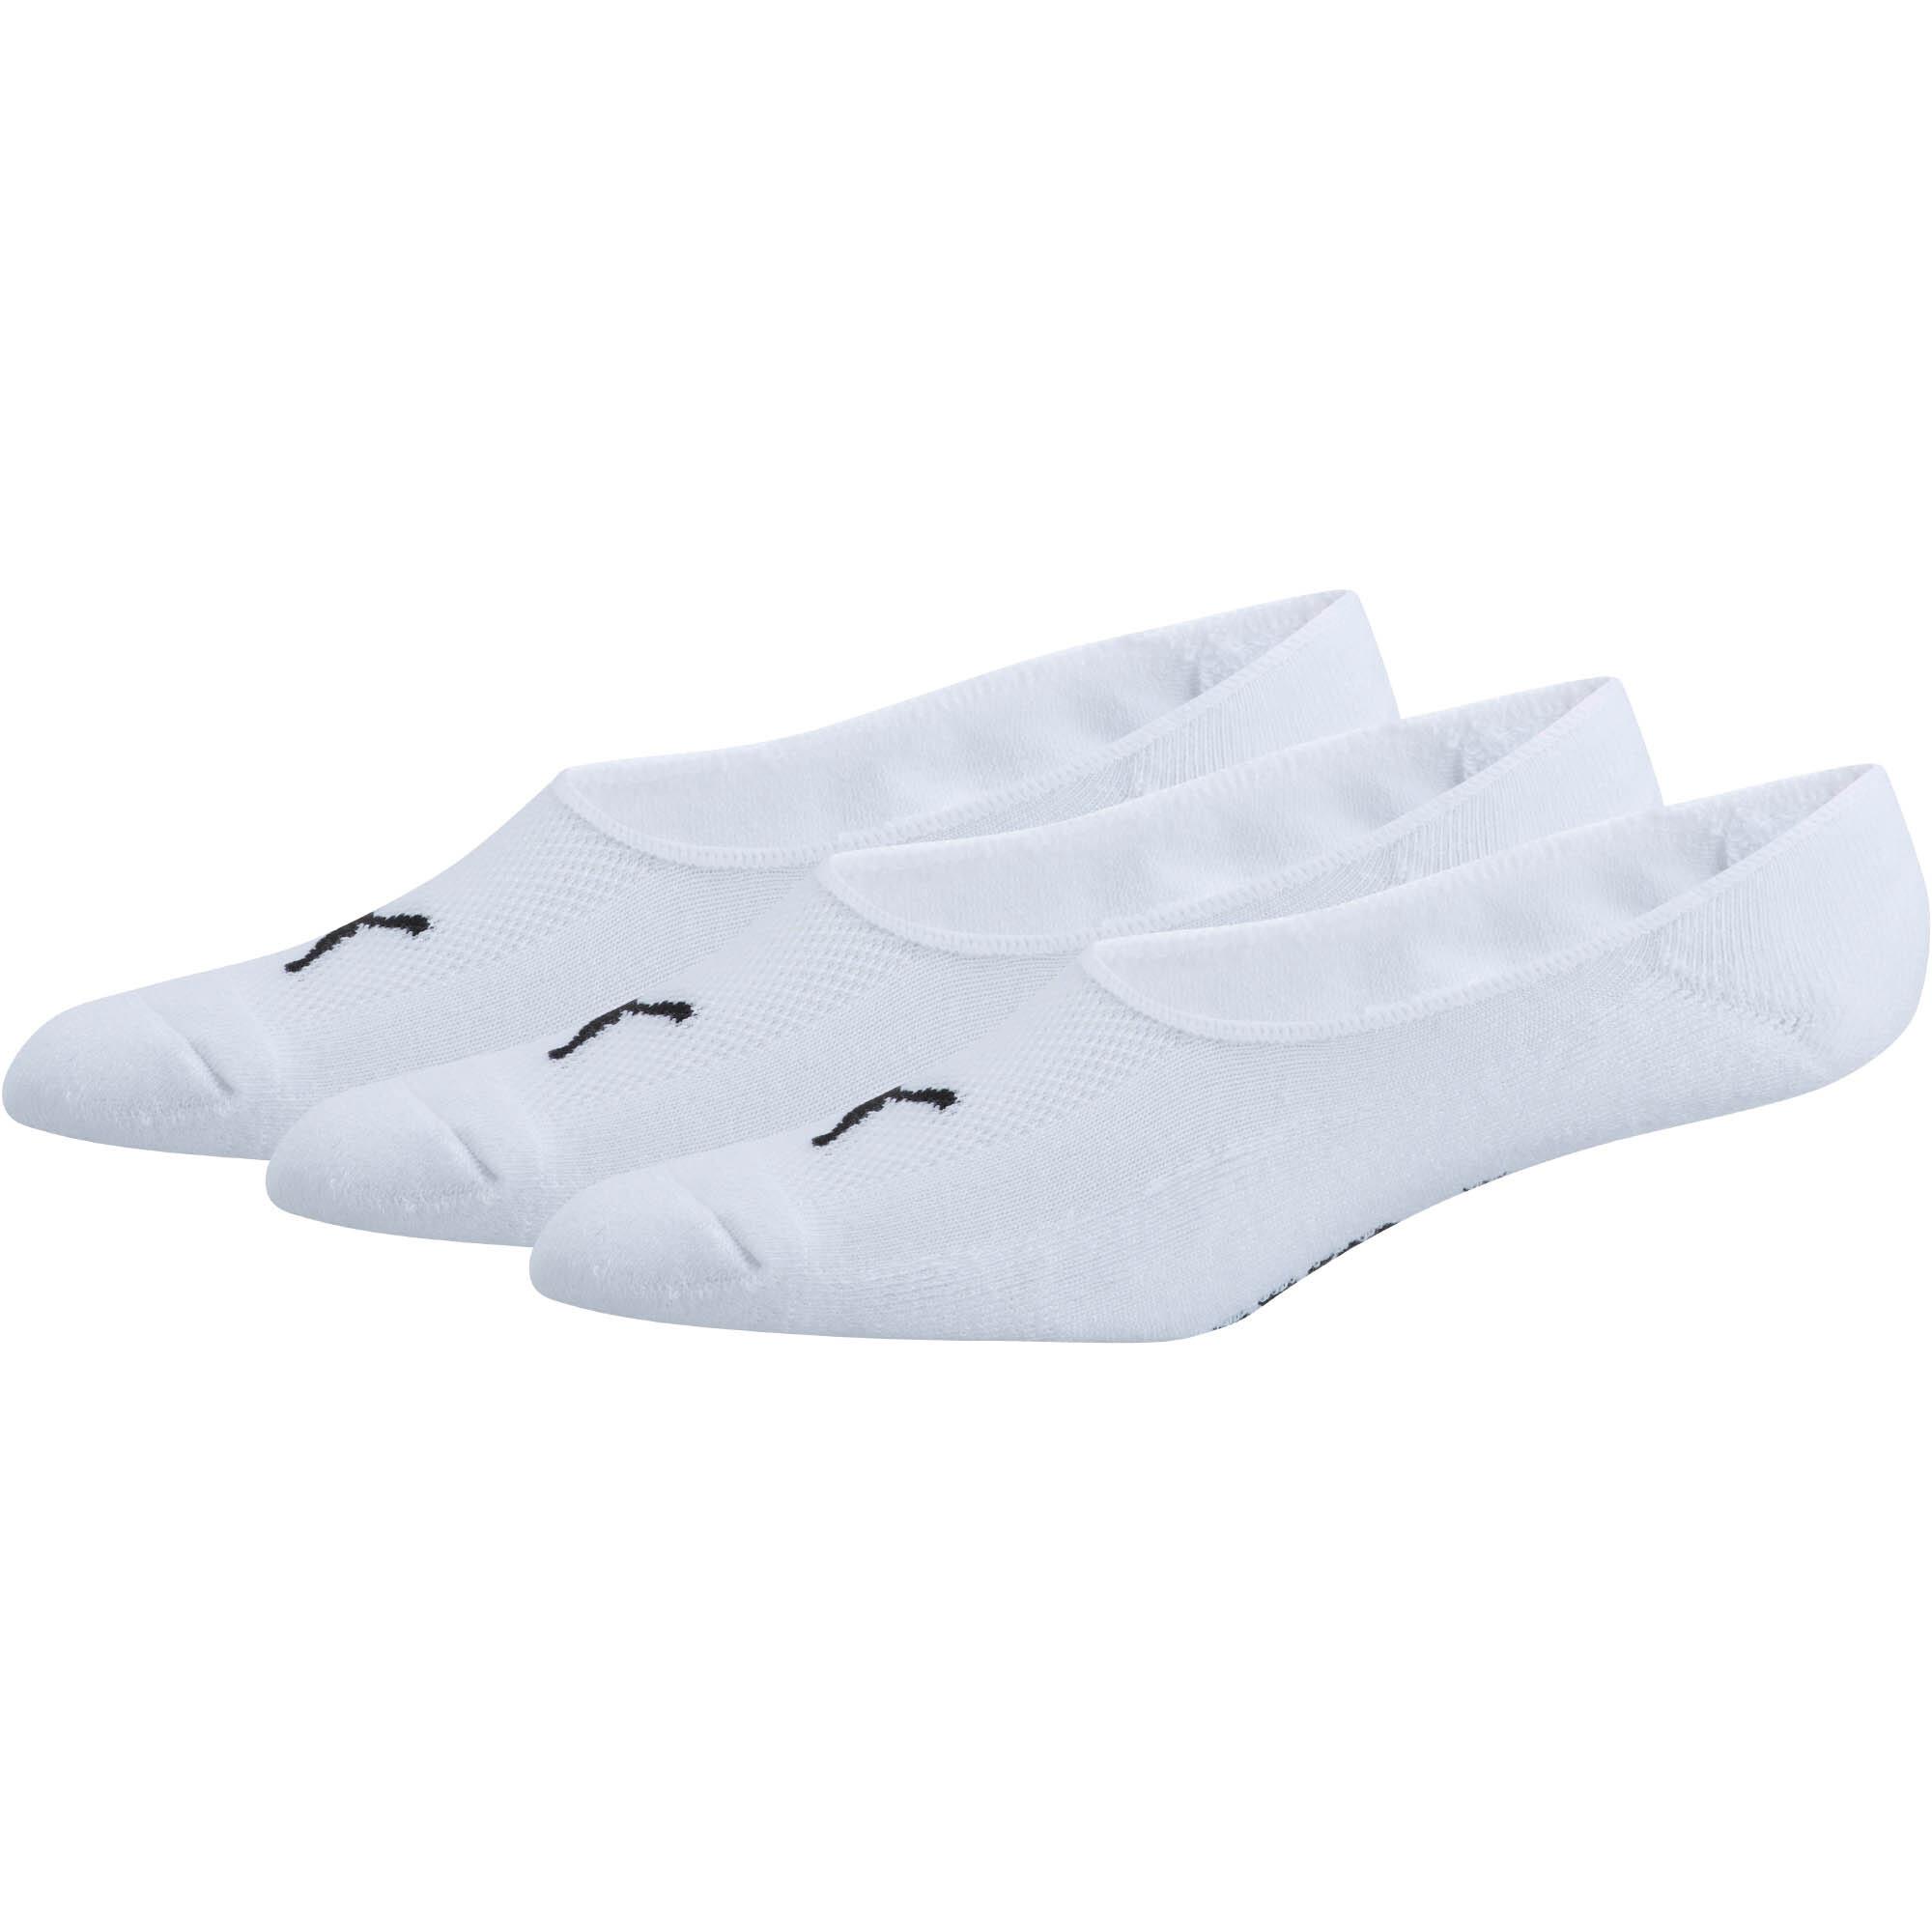 Puma Men's Liner Socks (3 Pack)